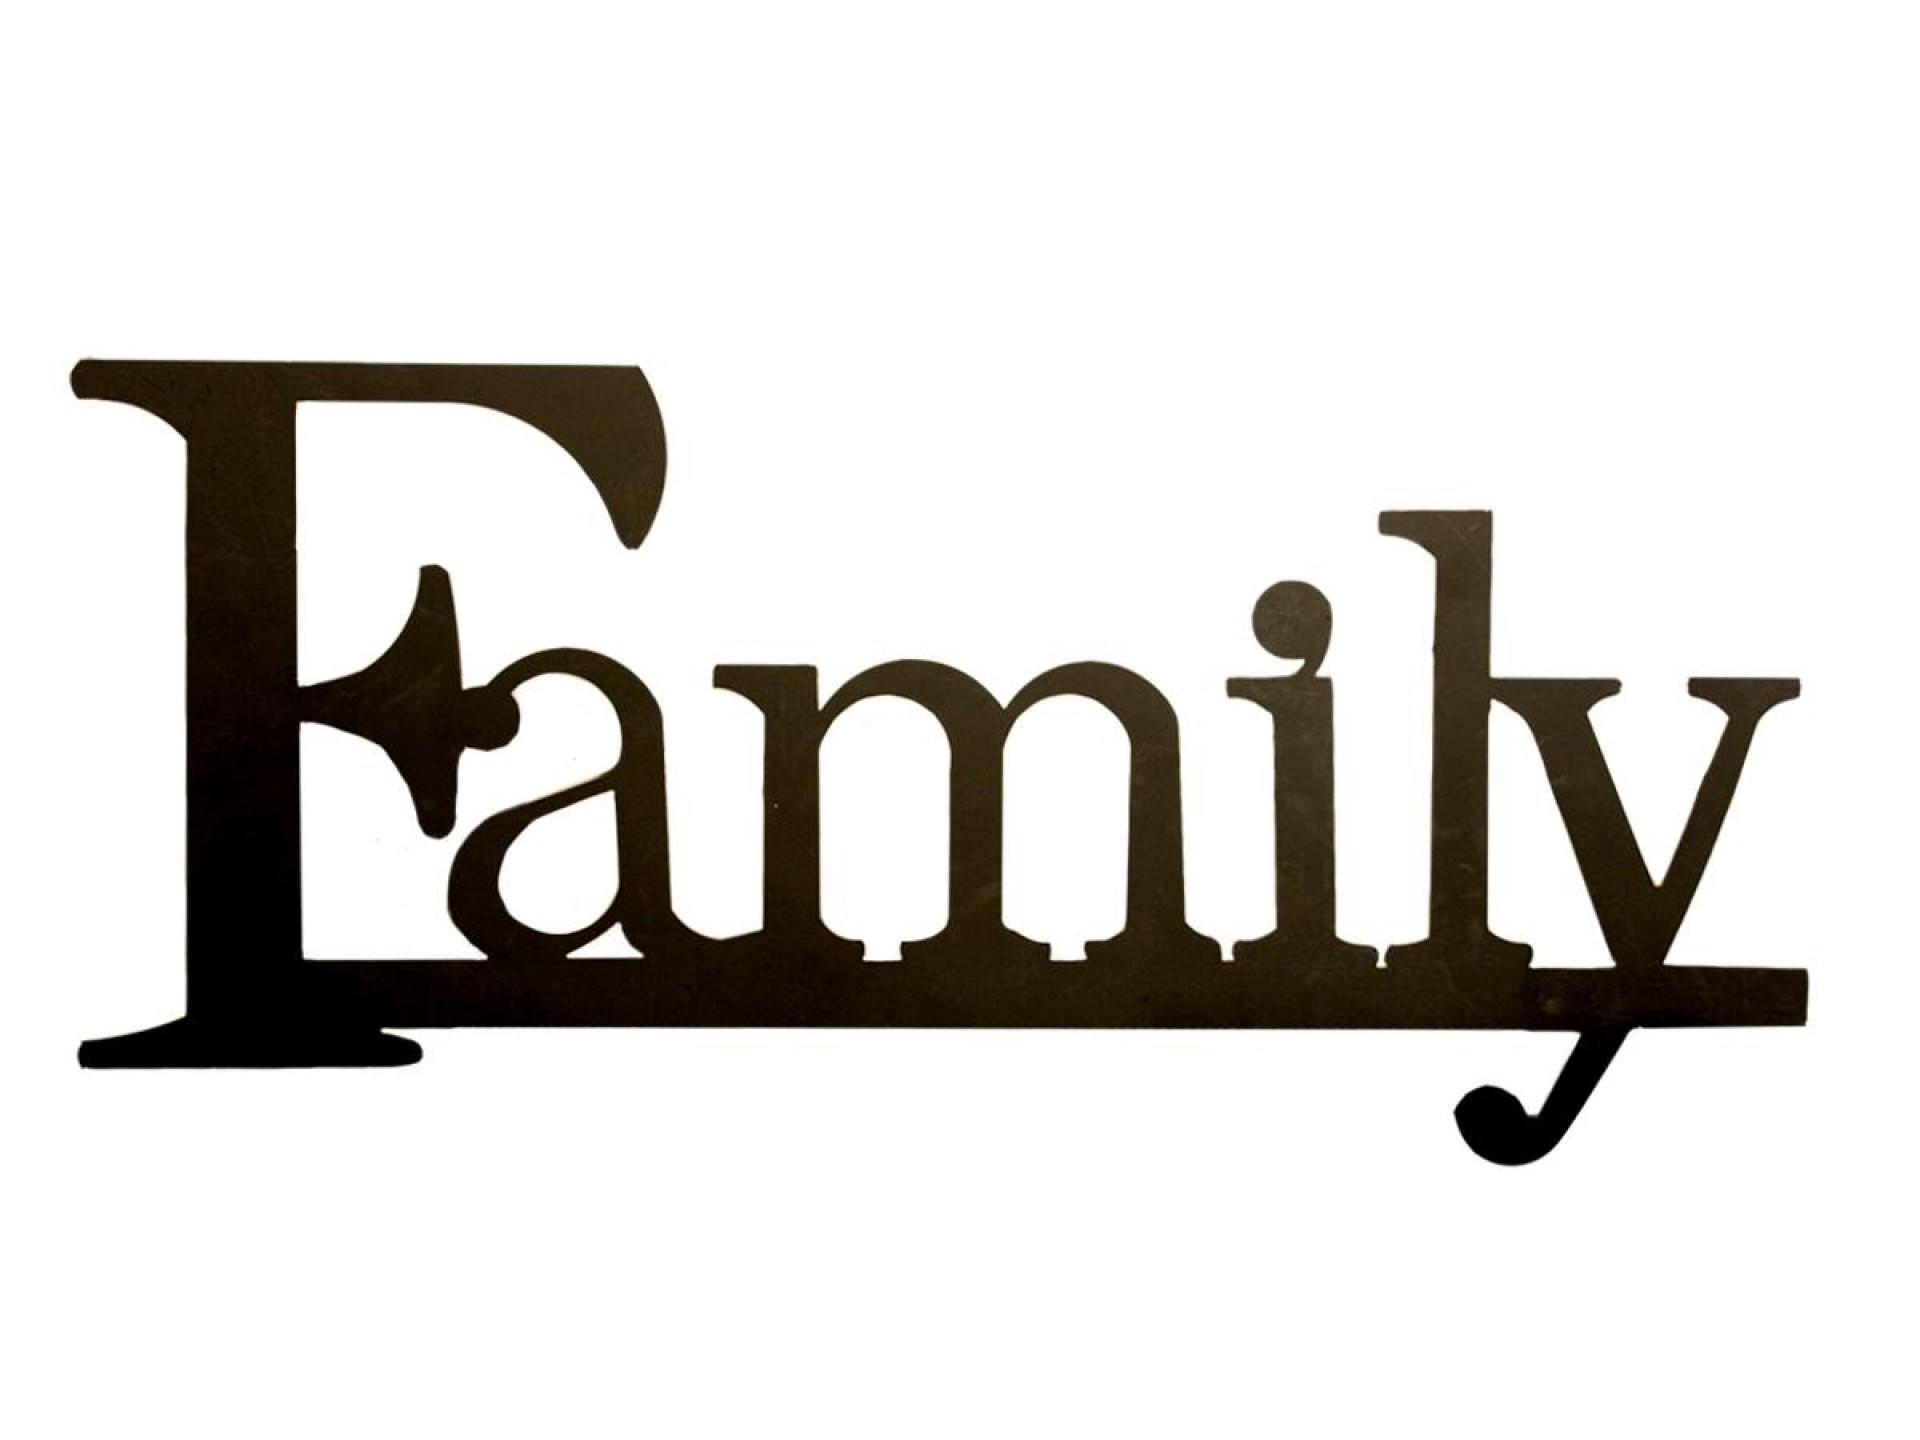 017 Family Essay My Word Images Lrgword Singular Relationships Introduction In Korean Broken 1920